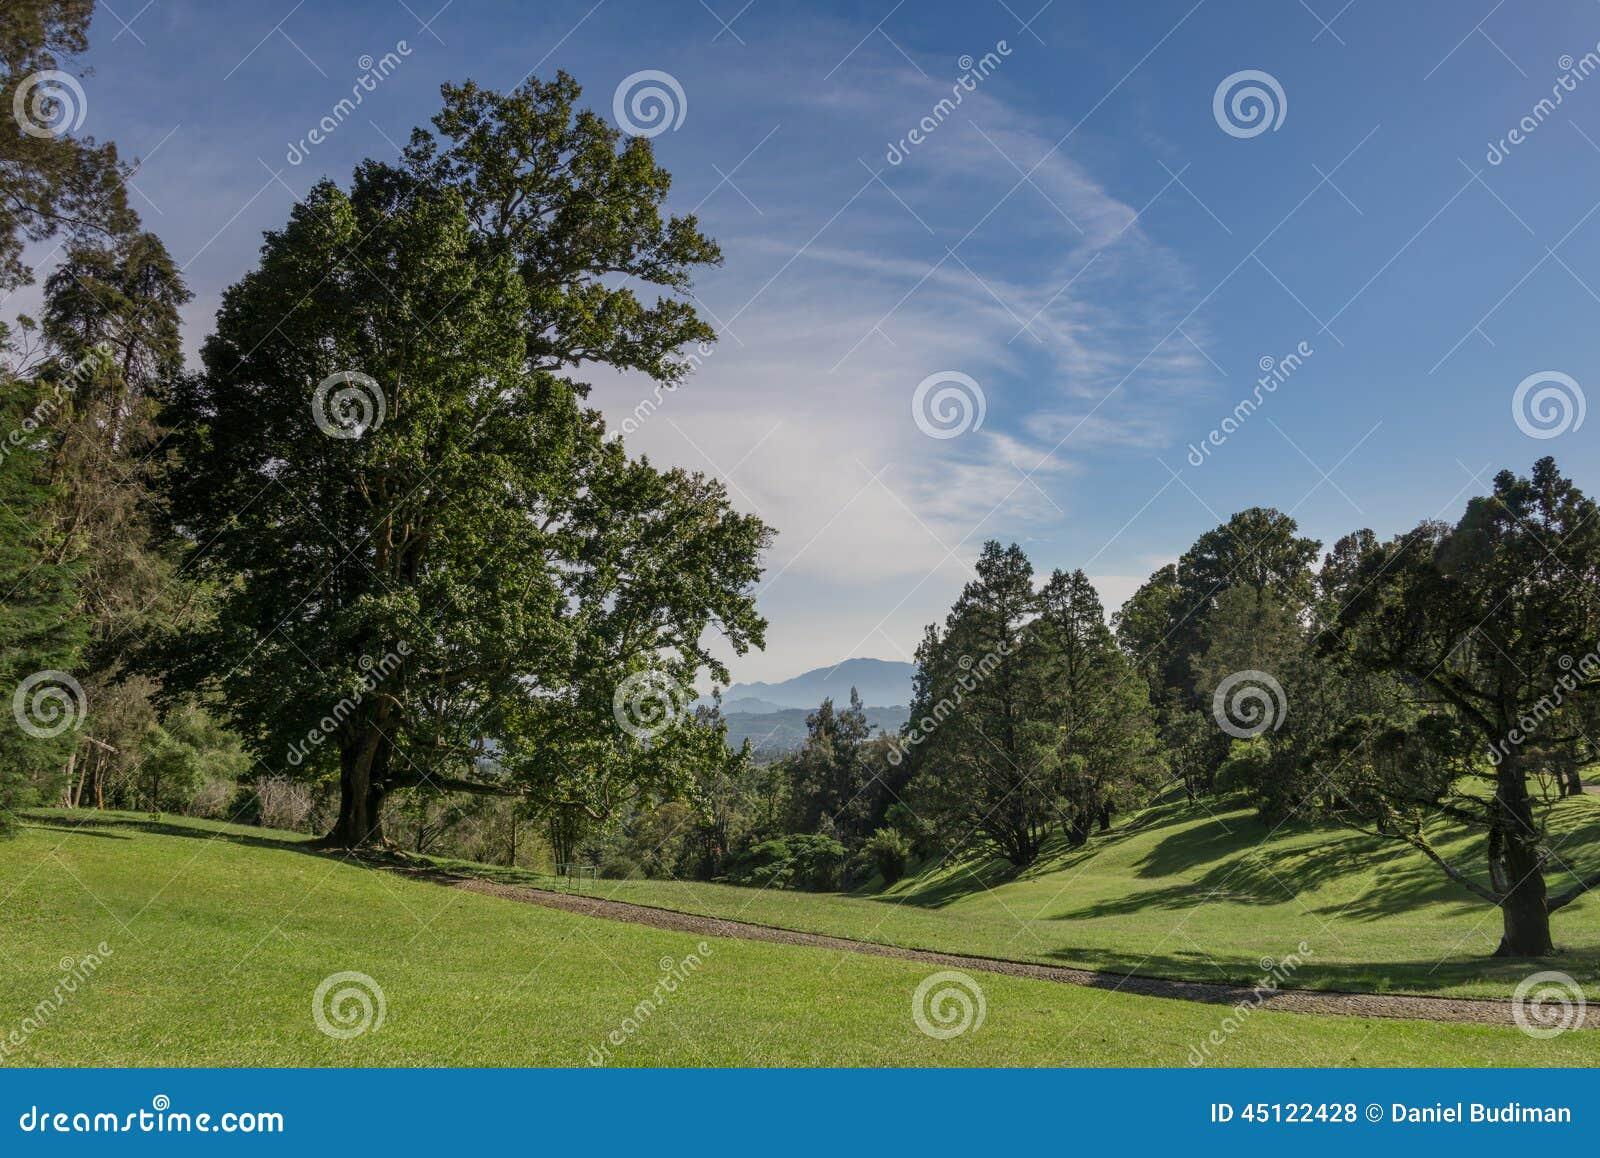 fotos de jardim grande:Foto de Stock: Jardim natural grande